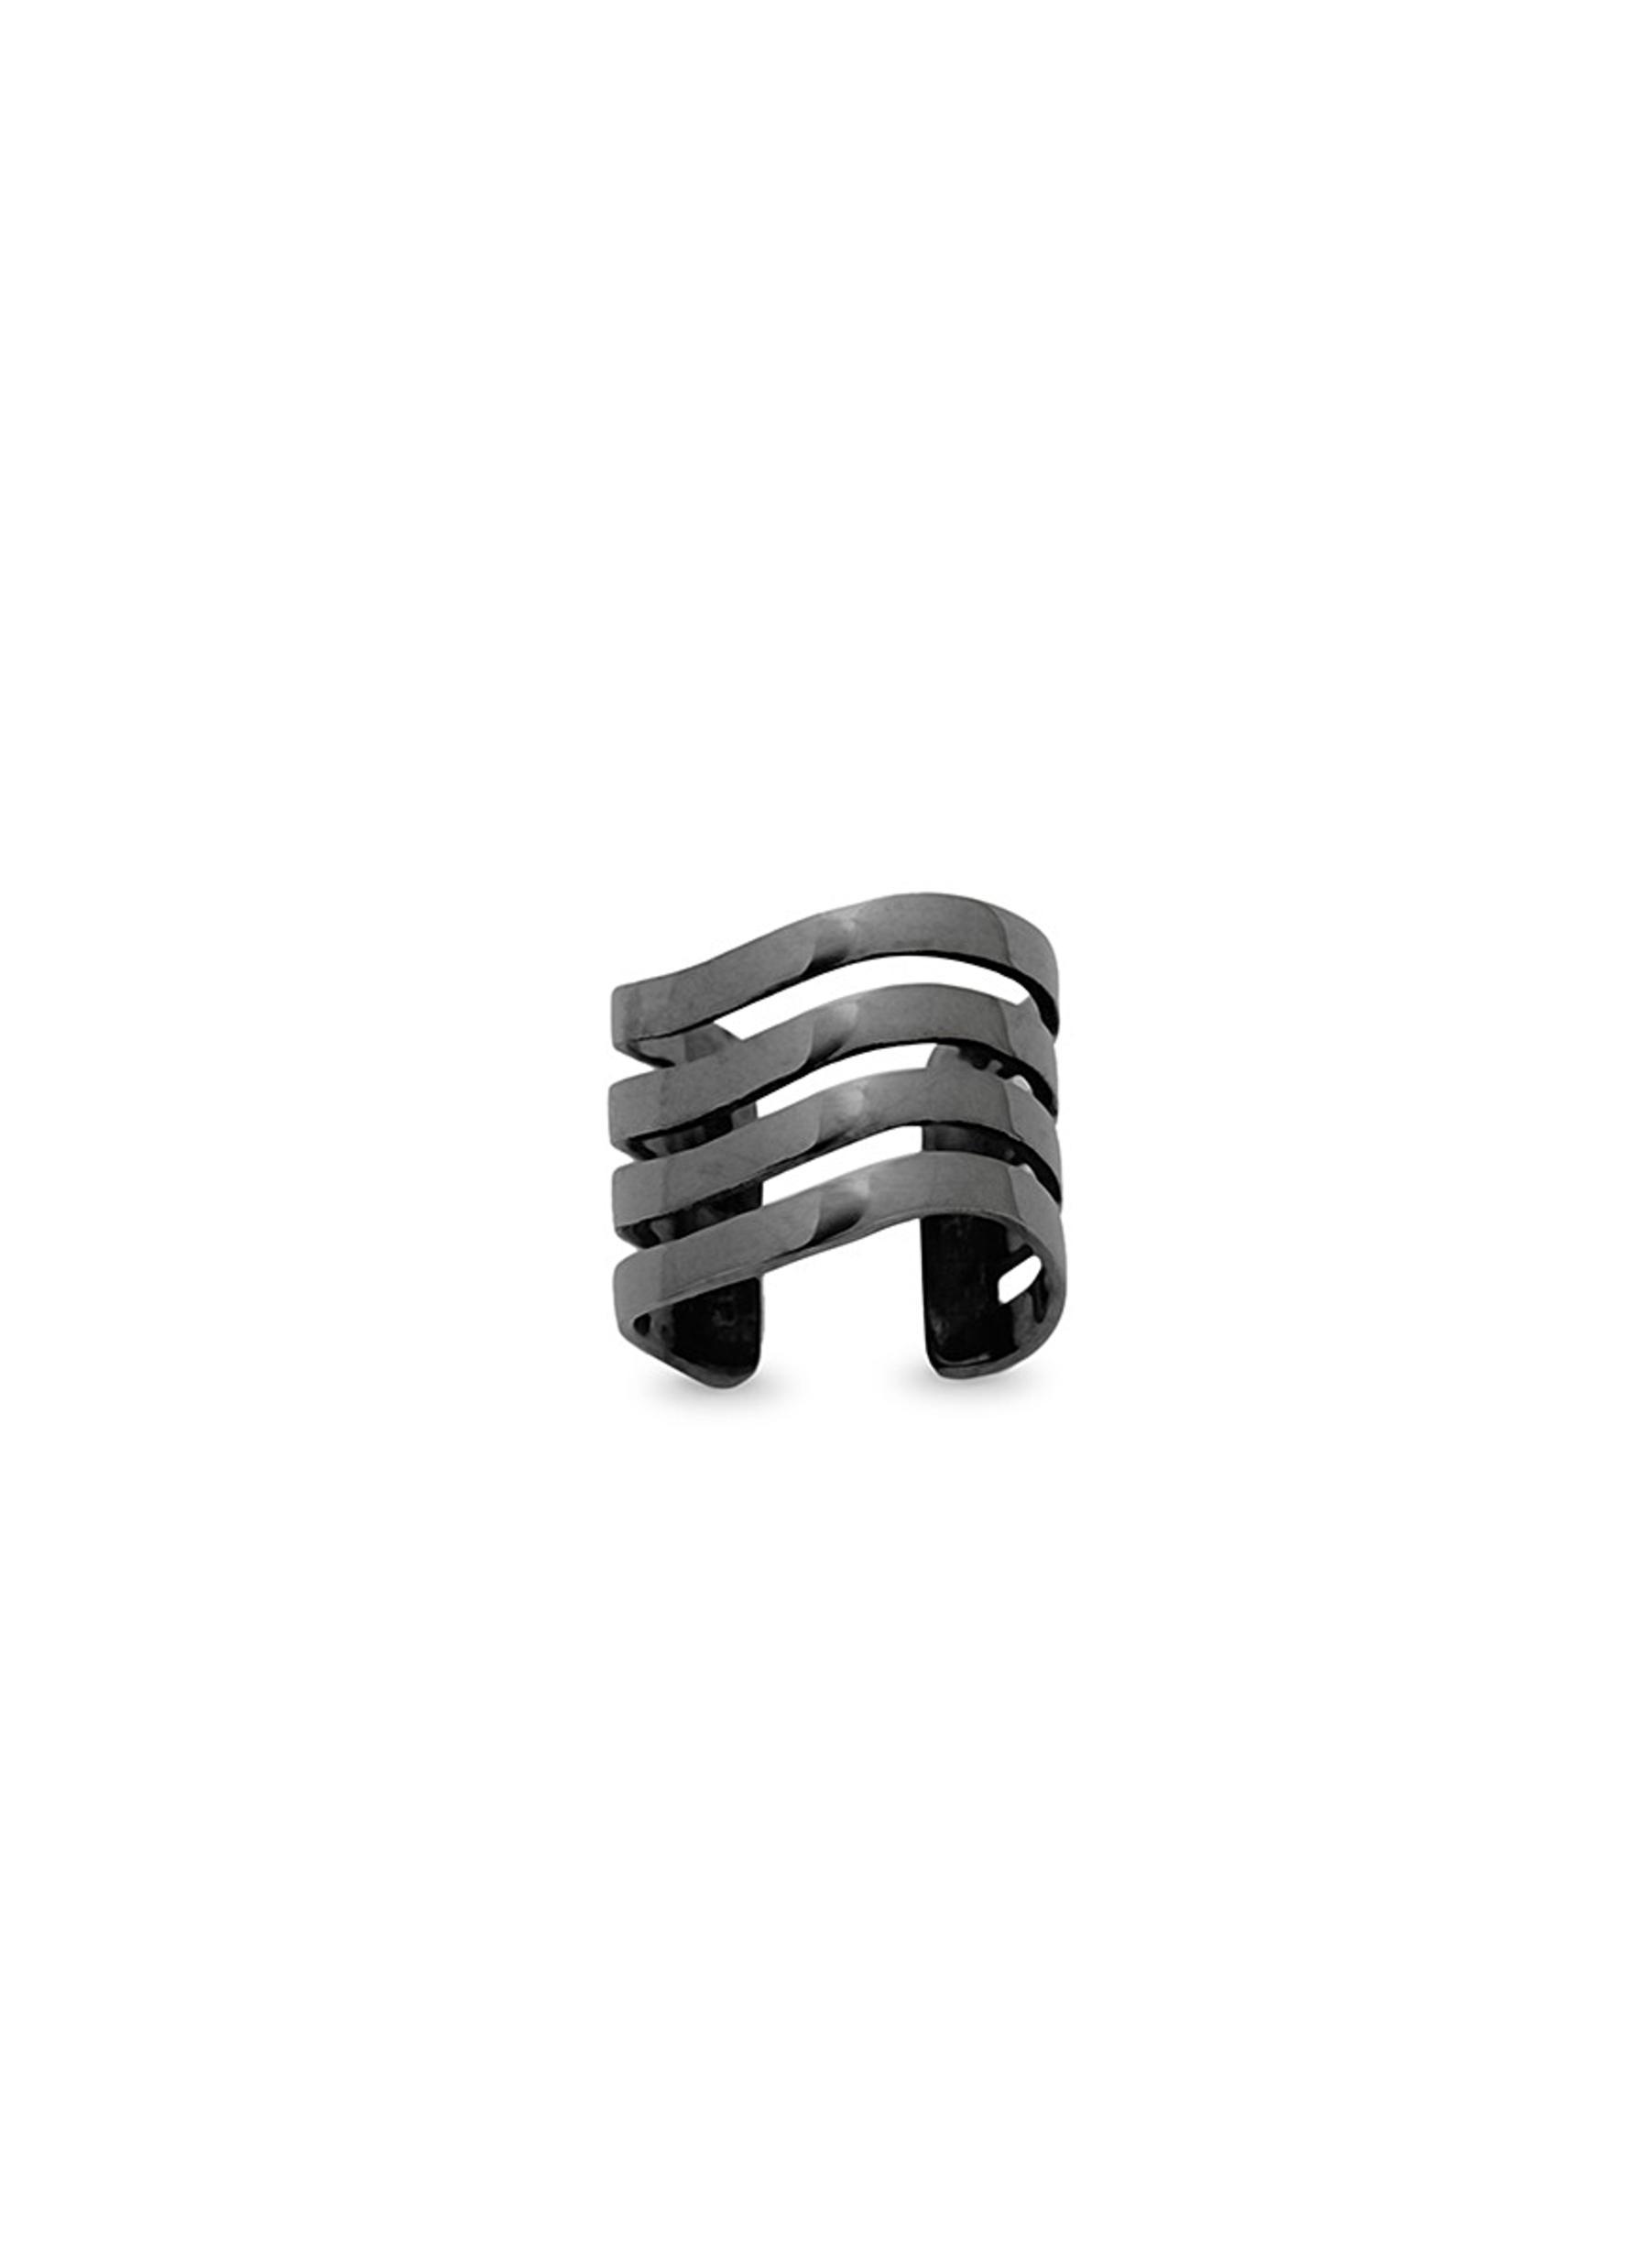 LYNN BAN 'Coil' black rhodium single ear cuff